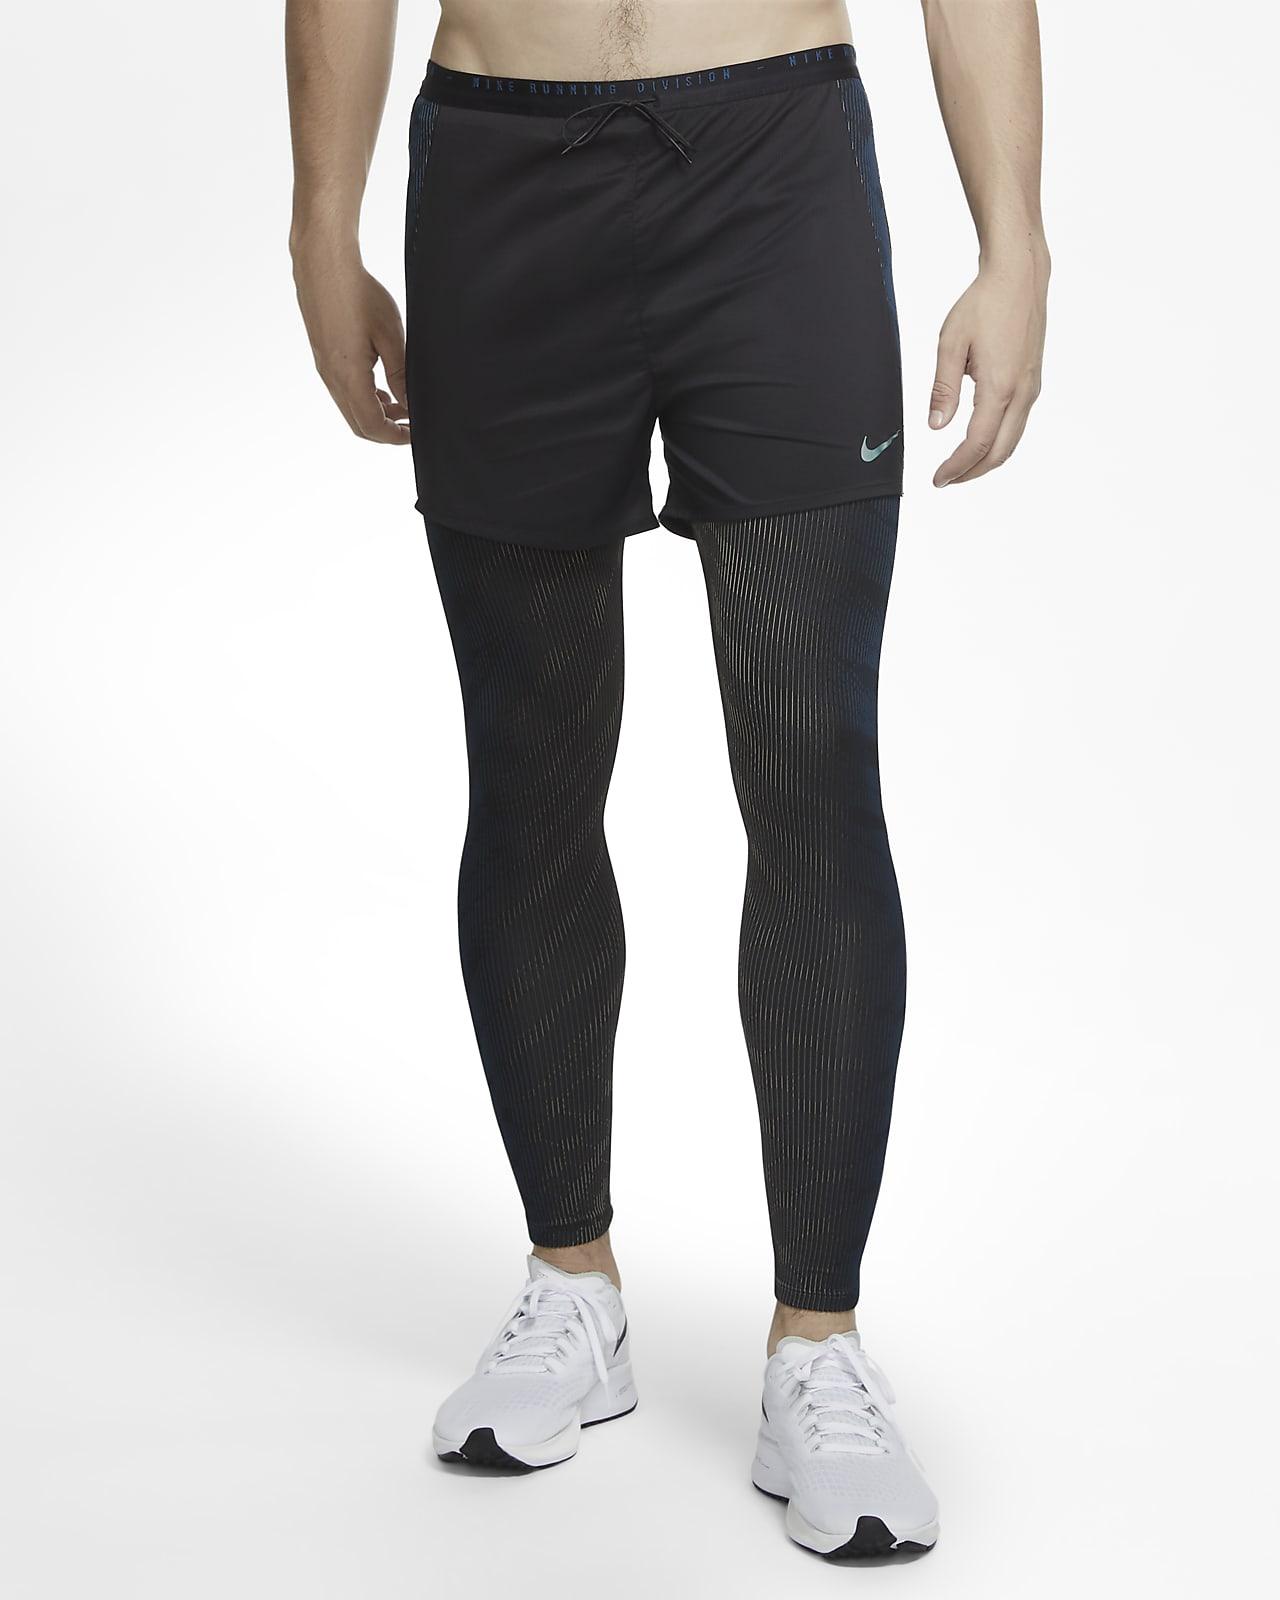 Nike Run Division Mallas de running híbridas - Hombre